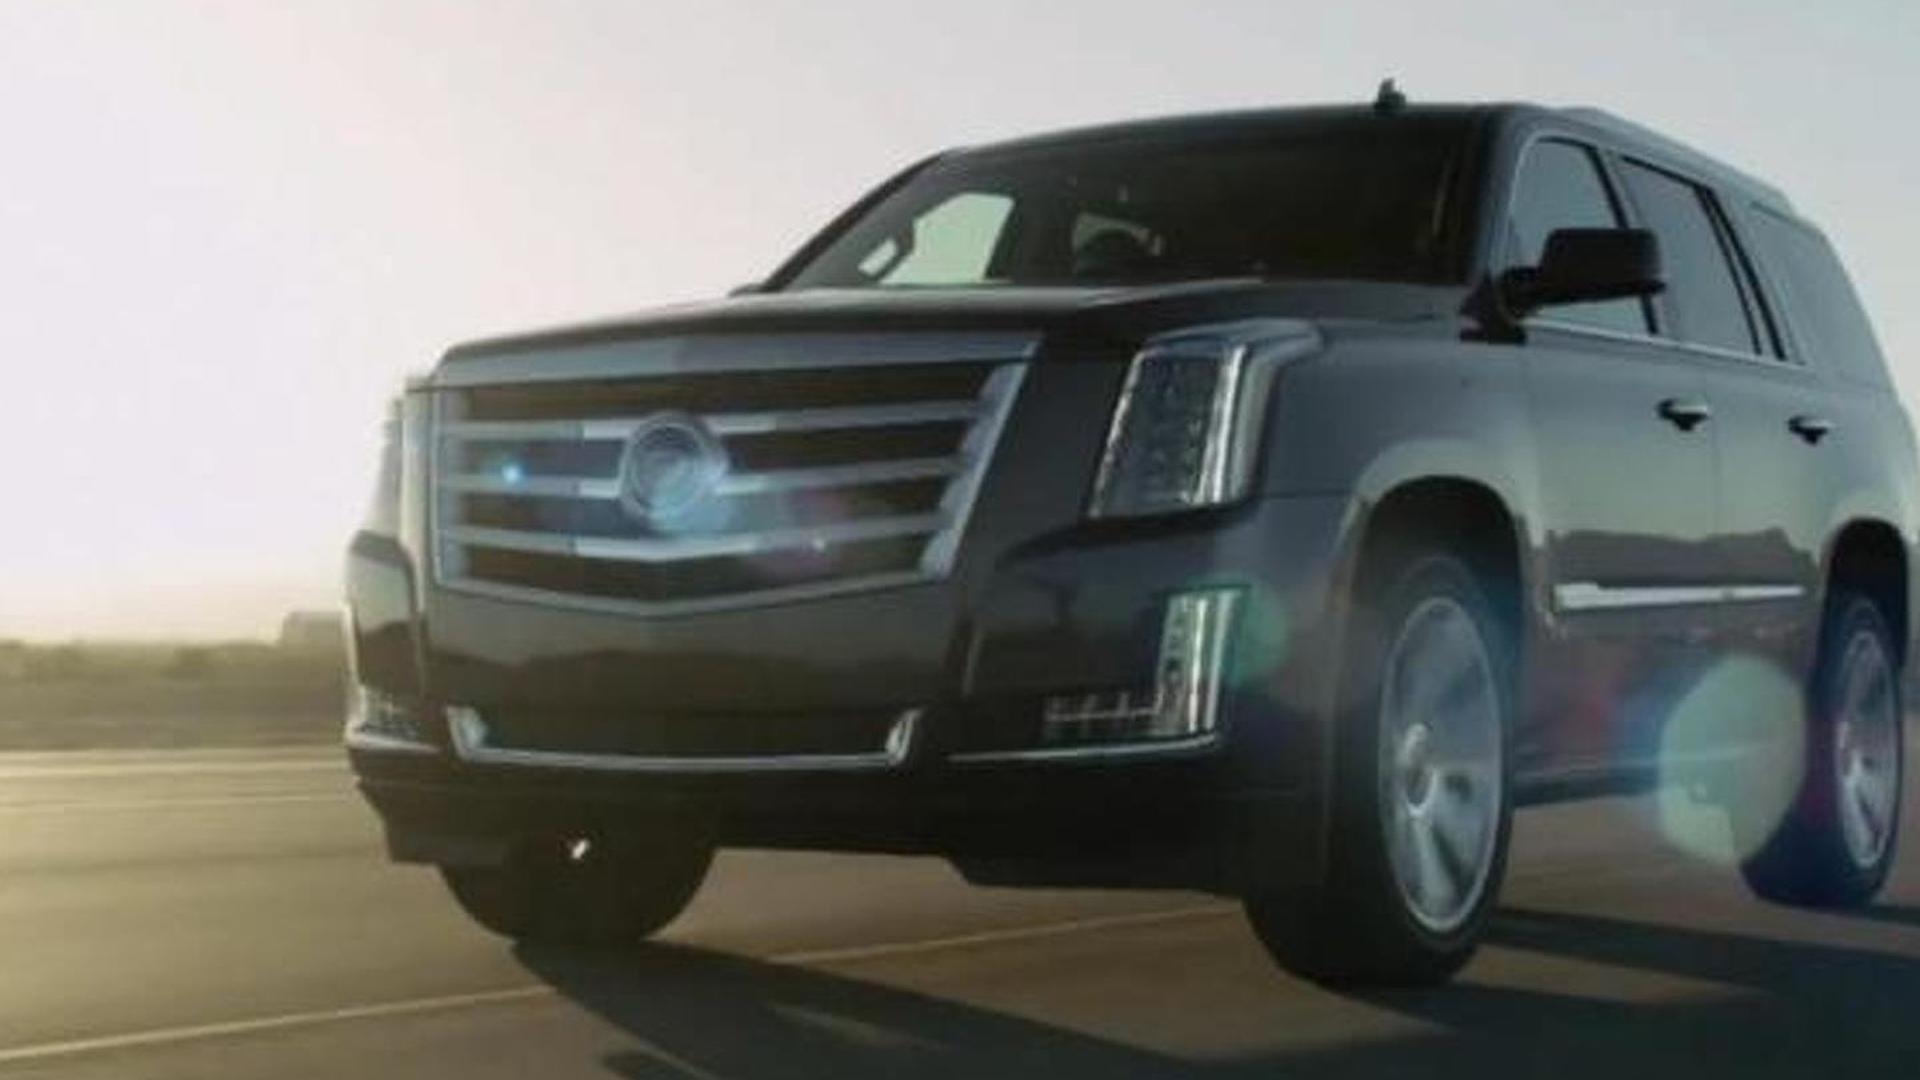 2015 Cadillac Escalade leaked